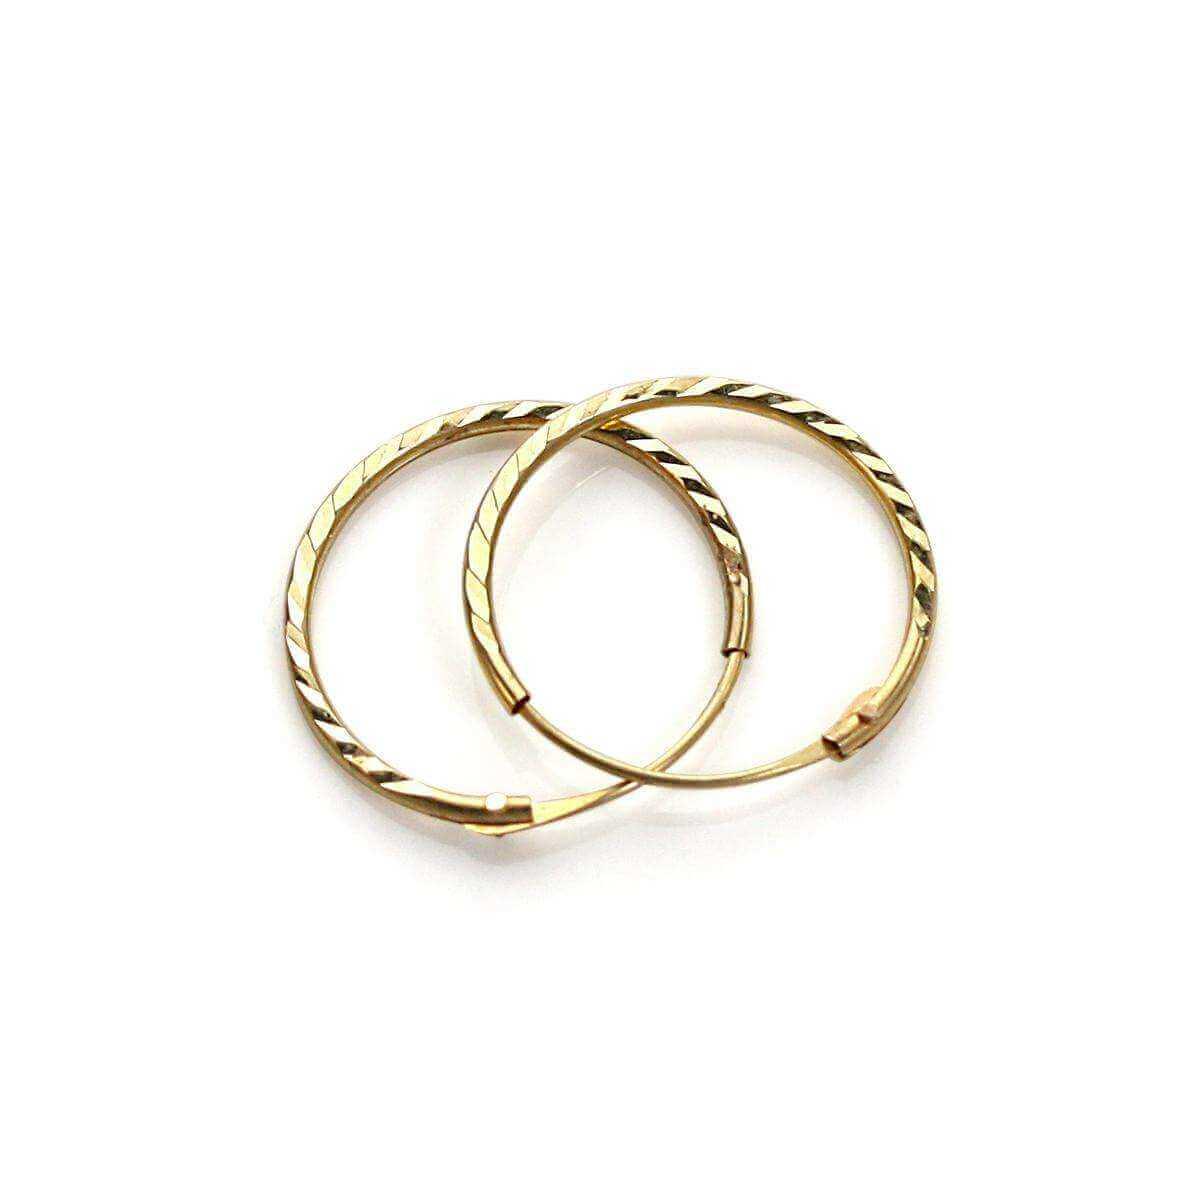 9ct Yellow Gold diamond cut 12mm Hoop Earrings